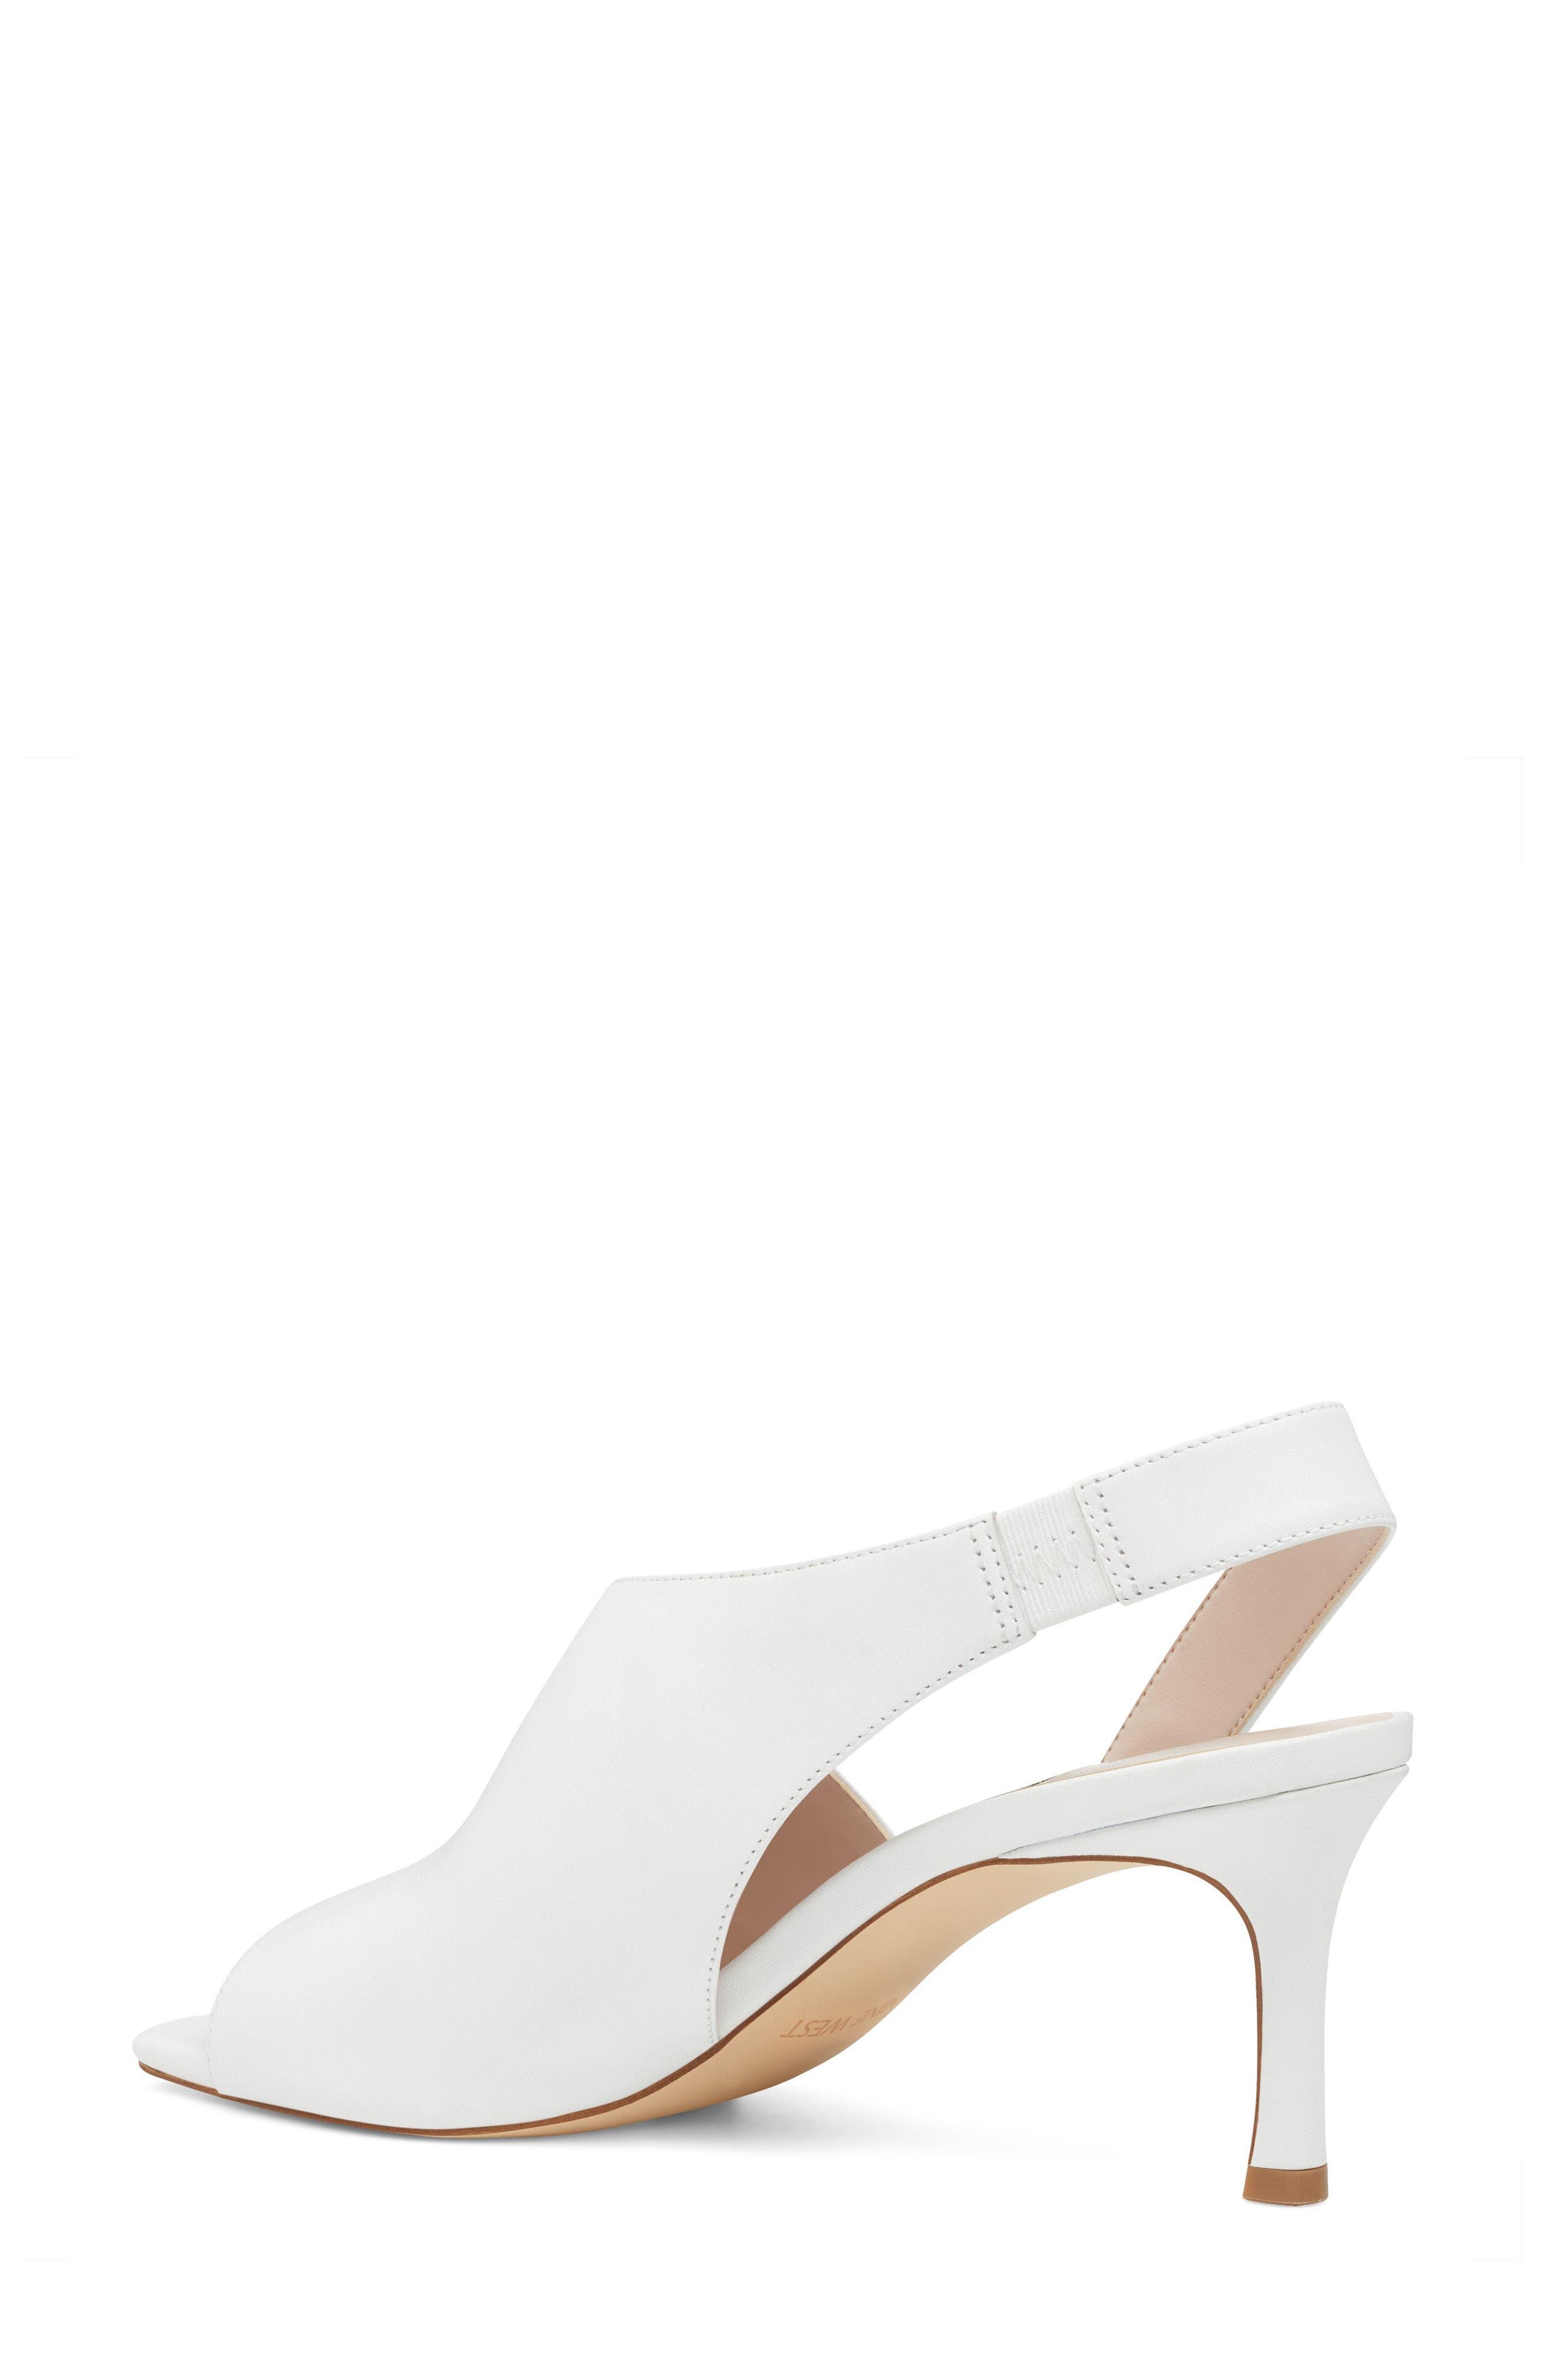 Orrus Asymmetrical Sandal,                             Alternate thumbnail 2, color,                             White Leather